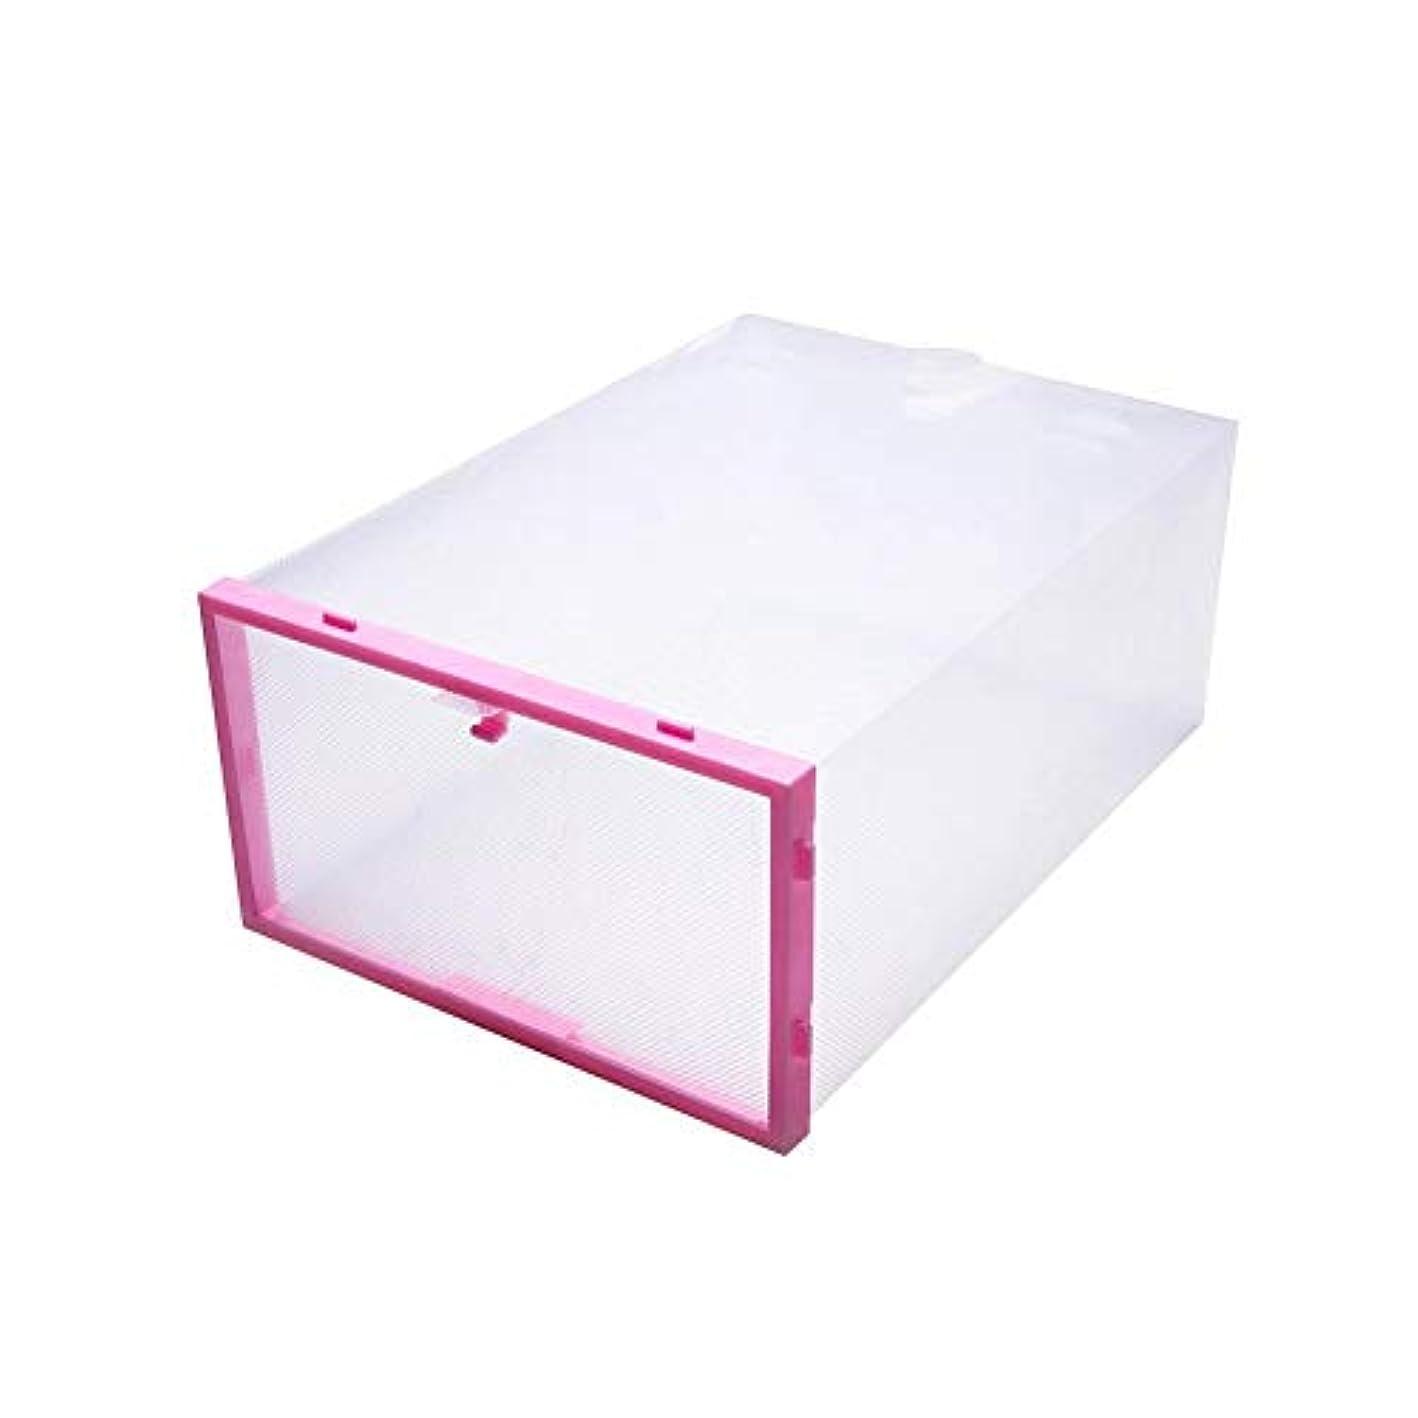 zhangbiao12 1pcs Shoe Storage Box Transparent Drawer Dustproof Thick Storage Shoe Box Plastic Storage Box